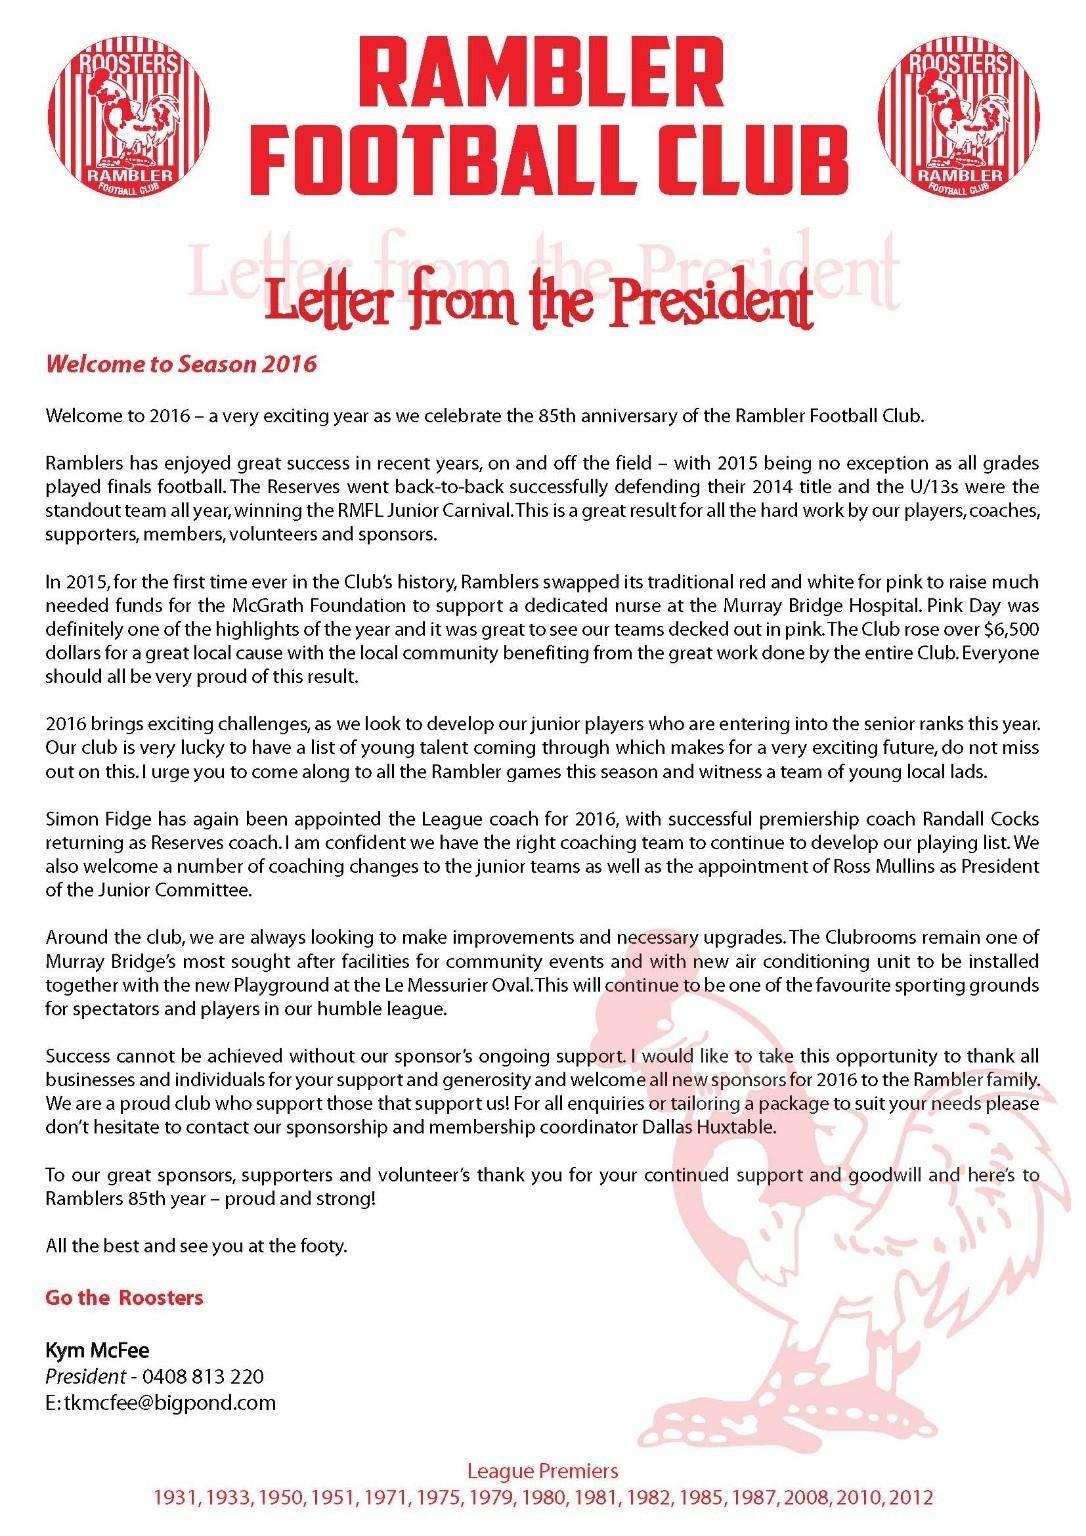 Sponsorship Packages - Rambler Football Club - SportsTG